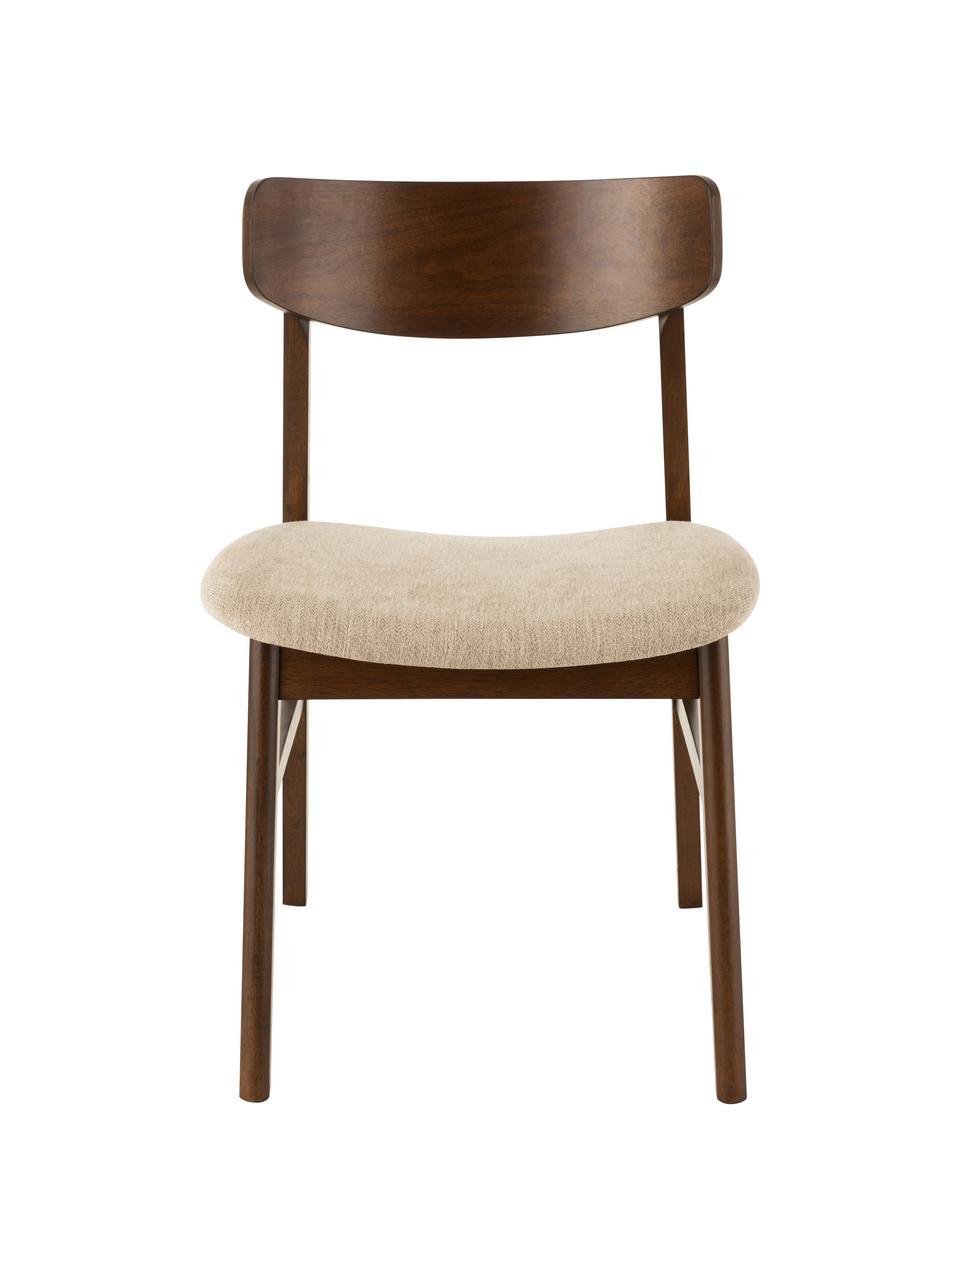 Holzstuhl Ken aus dunklem Holz, Bezug: Polyester, Gestell: Gummibaumholz, Braun, Beige, B 57 x T 53 cm